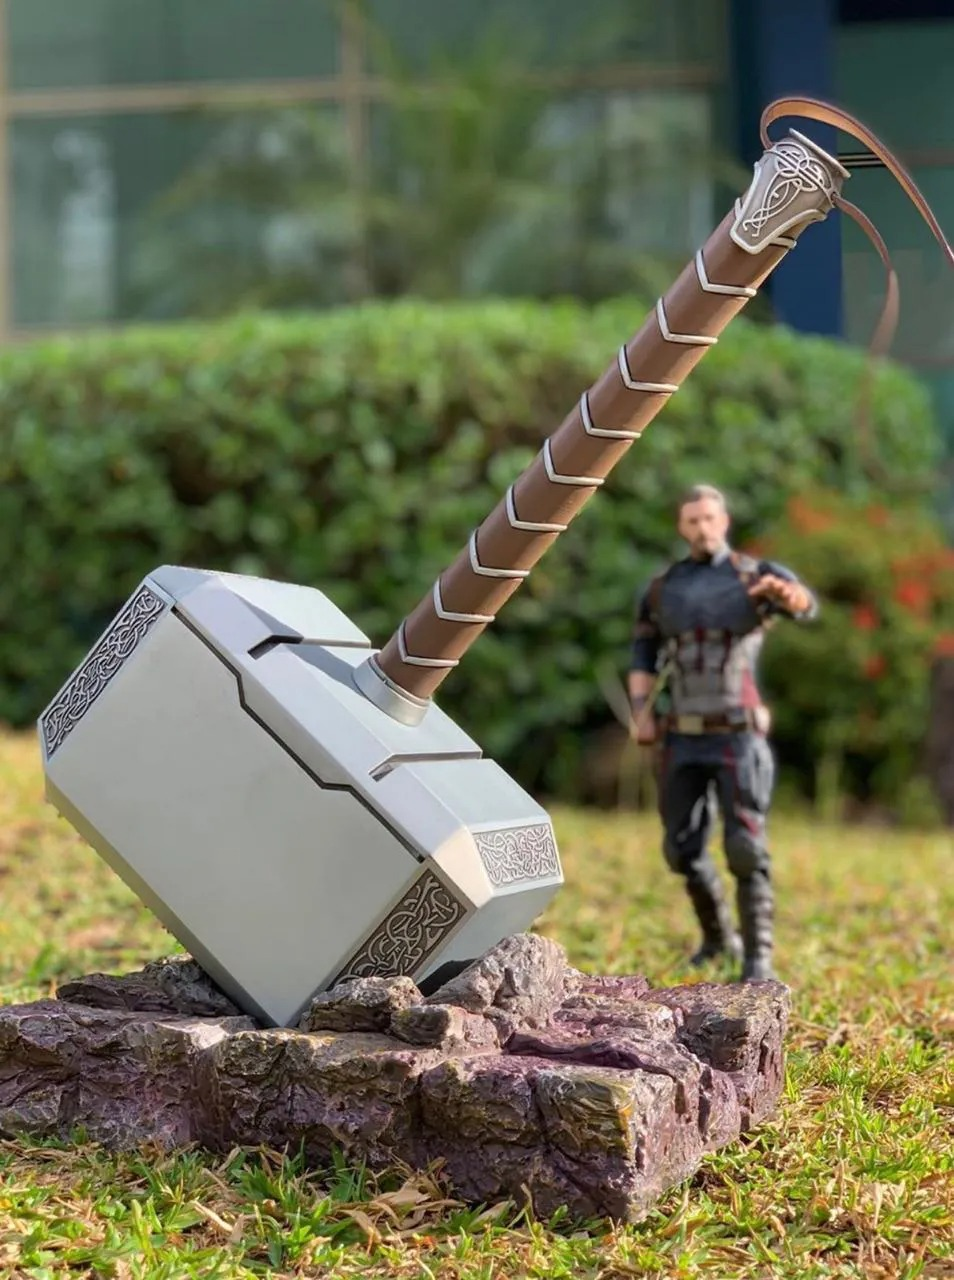 Réplica Martelo Thor (Mjolnir): Os Vingadores (The Avengers) Escala 1/1 (Sem Base)